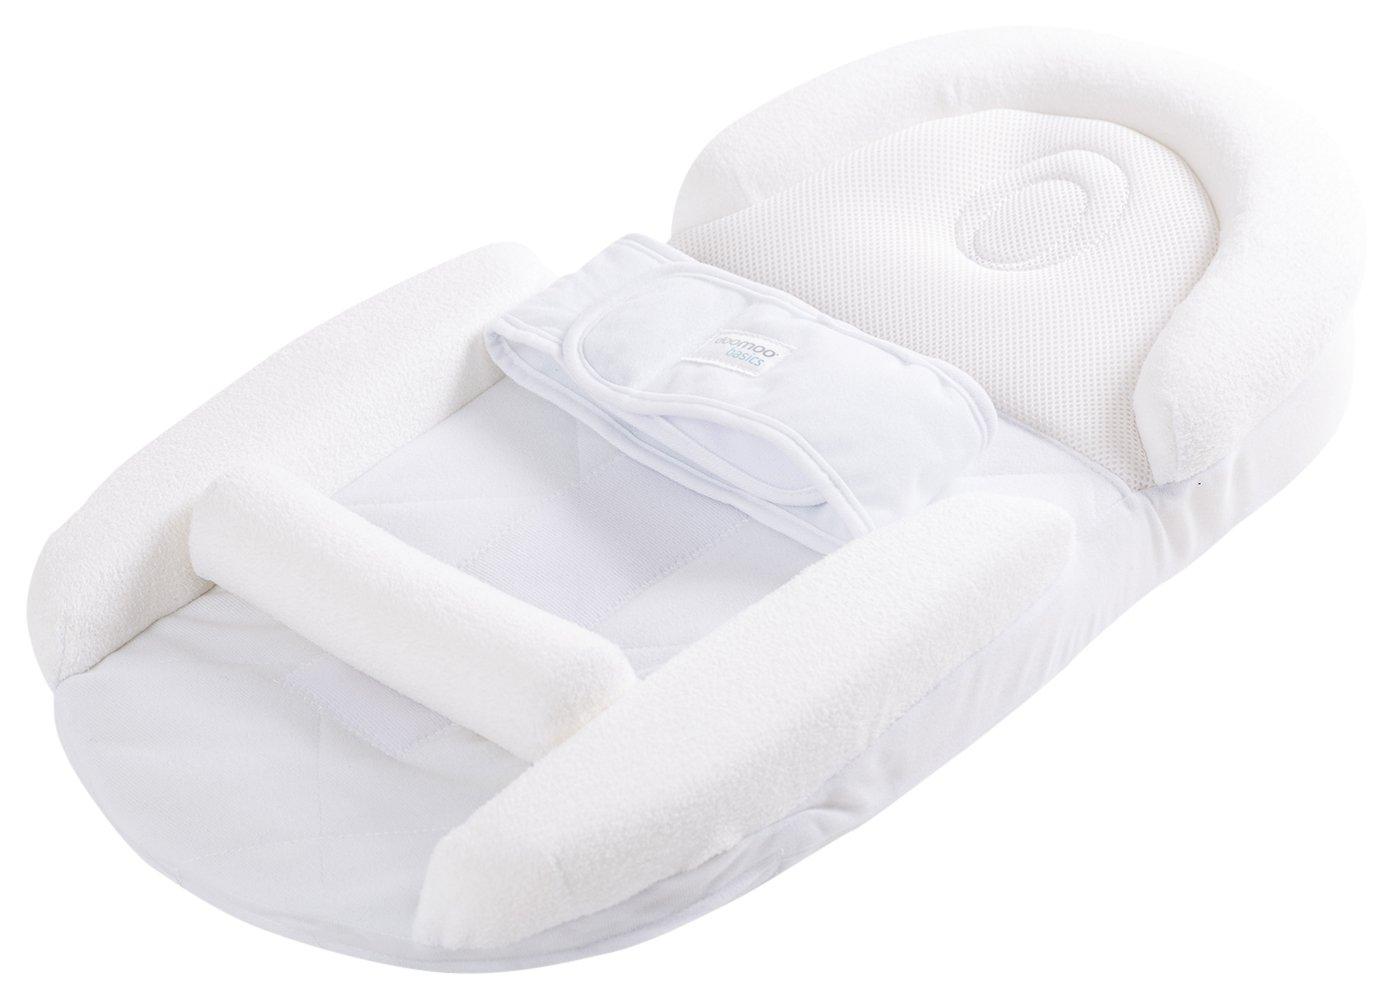 doomoo basics Nid de Couchage Uni Blanc EZ33B 40 082 001